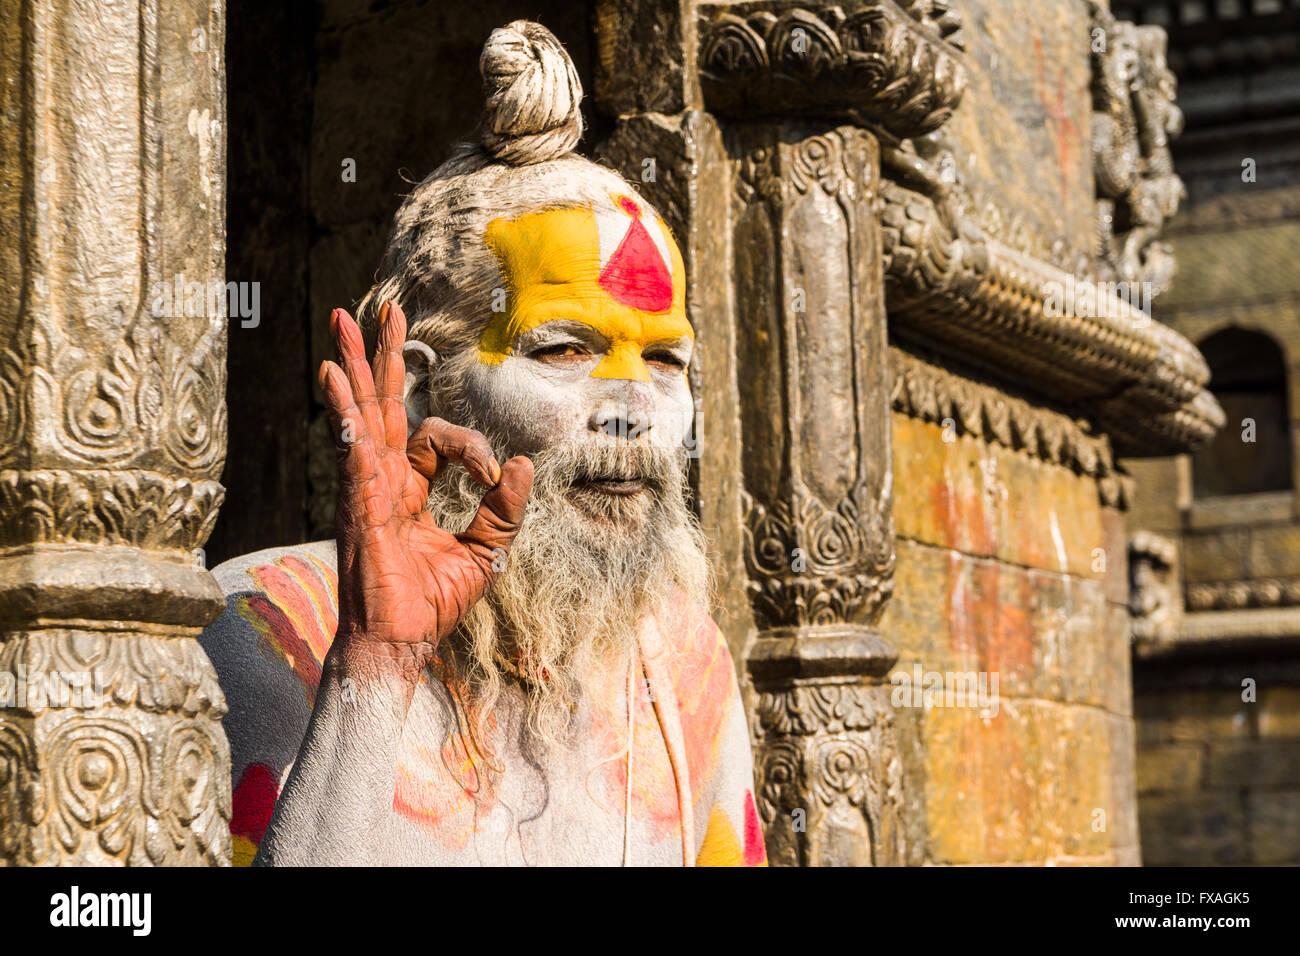 The portrait of a Sadhu, holy man, sitting in a doorway of Pashupatinath Temple, Kathmandu, Nepal Stock Photo